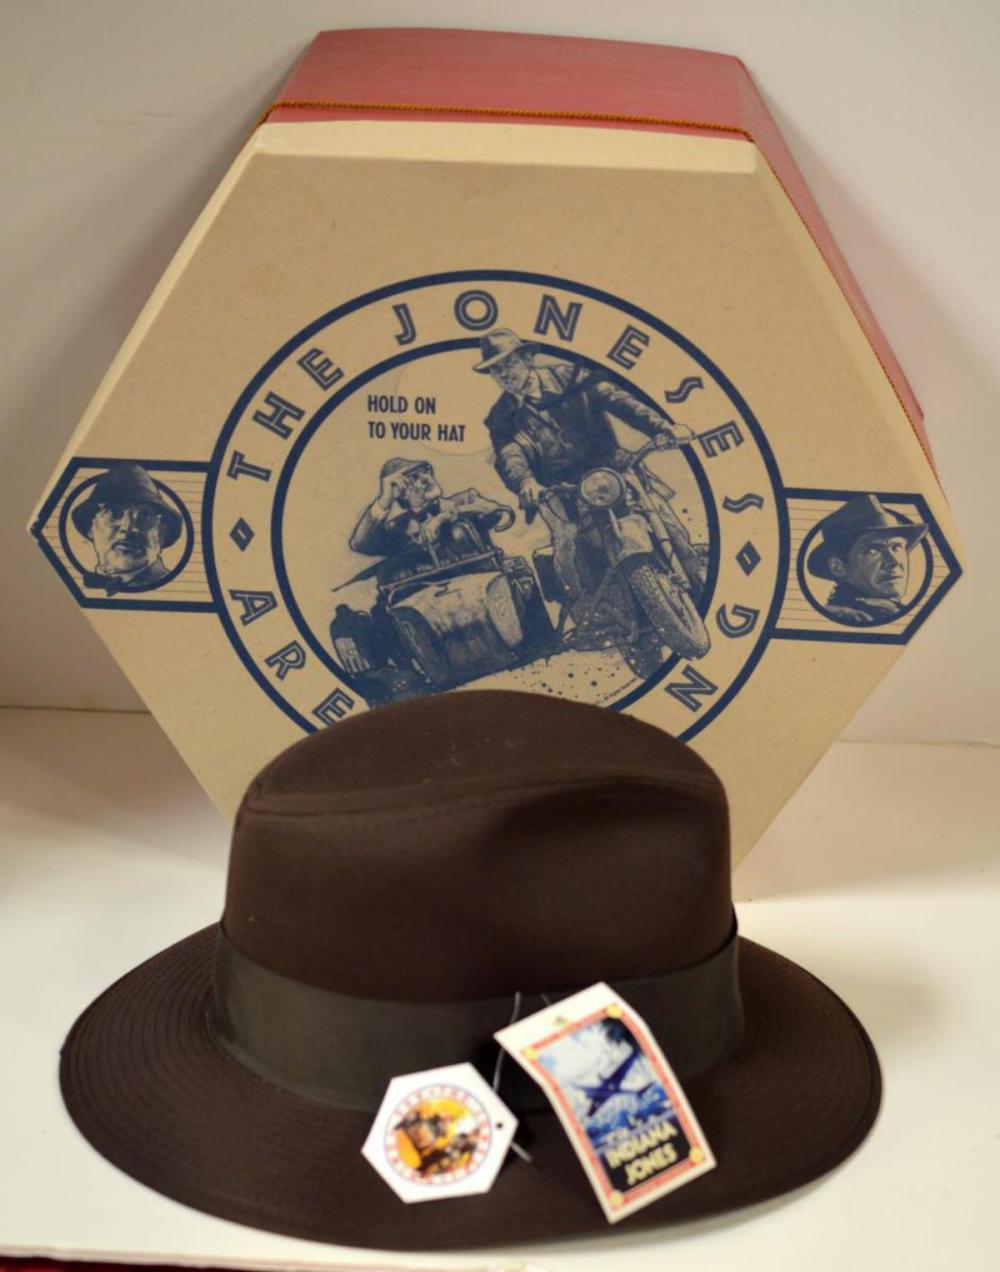 1989 Indiana Jones Stetson Fedora in Original Box